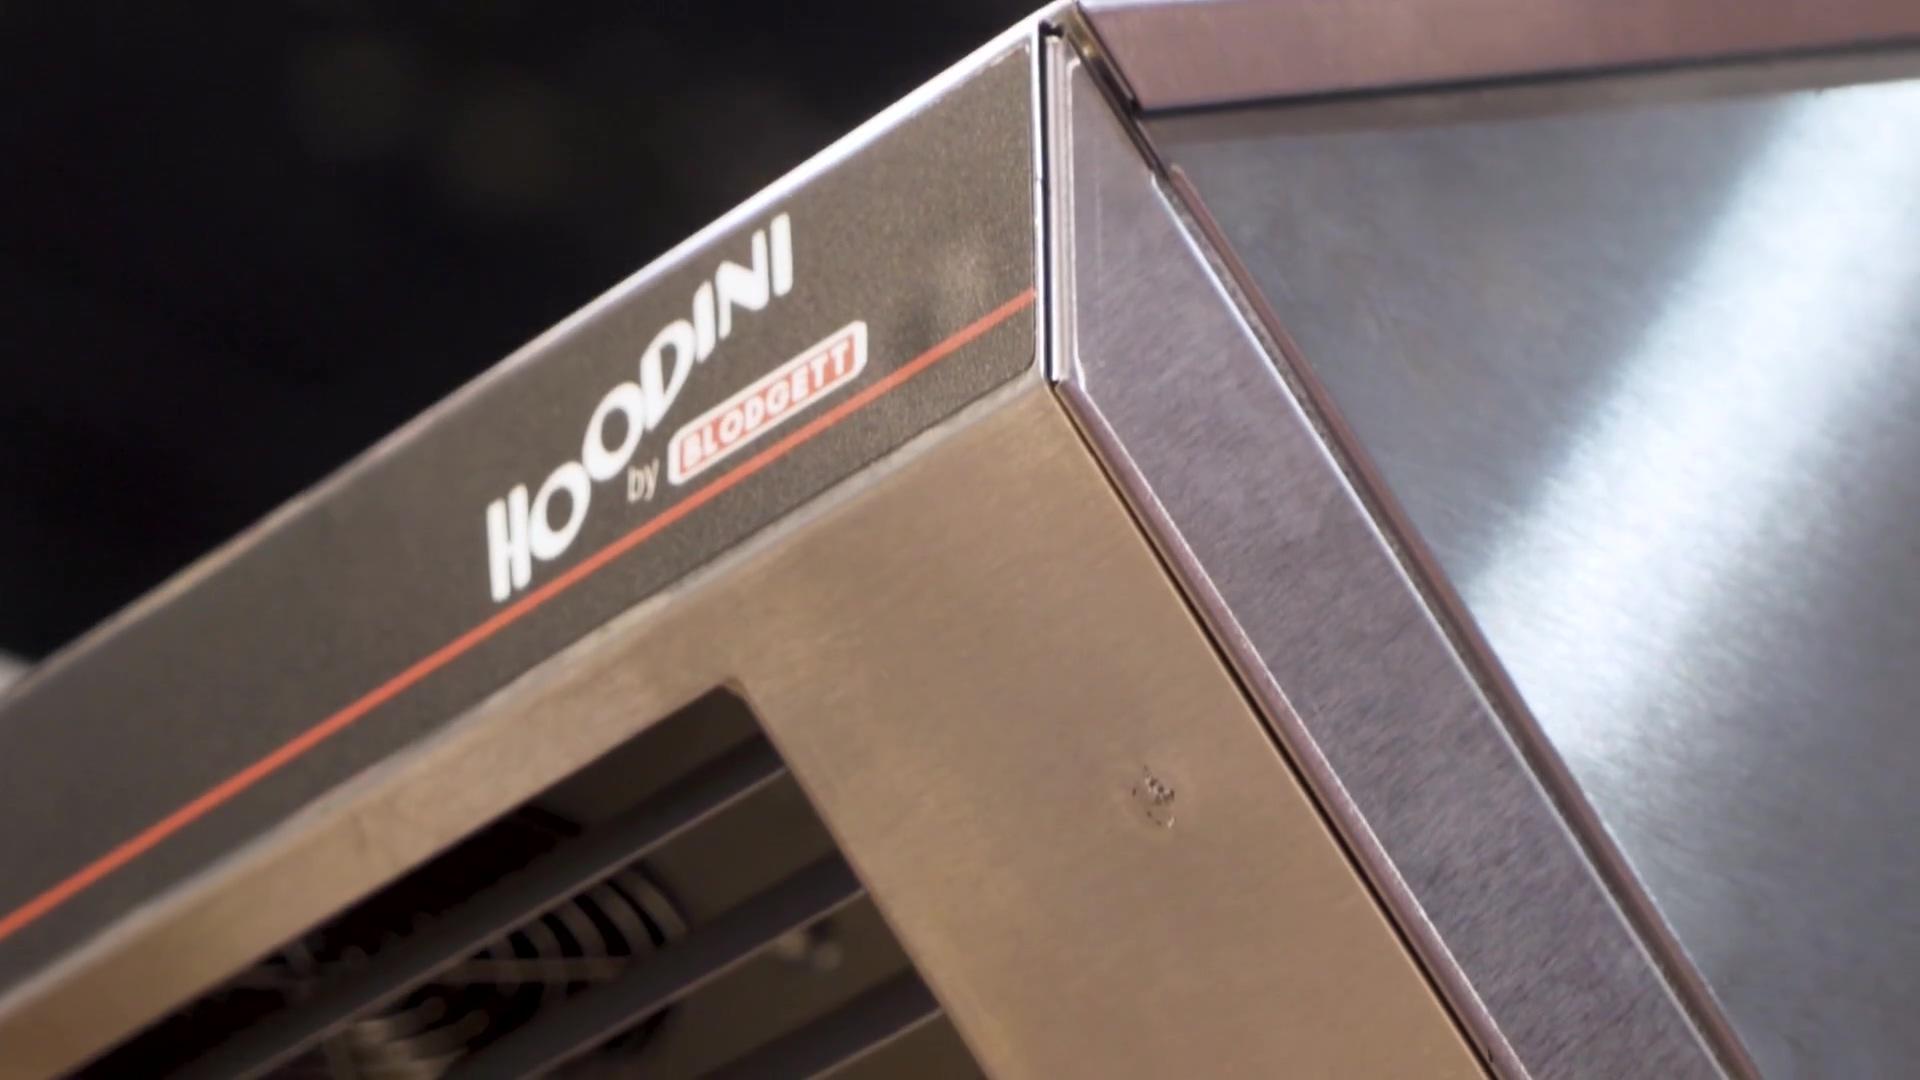 Blodgett Hoodini Oven